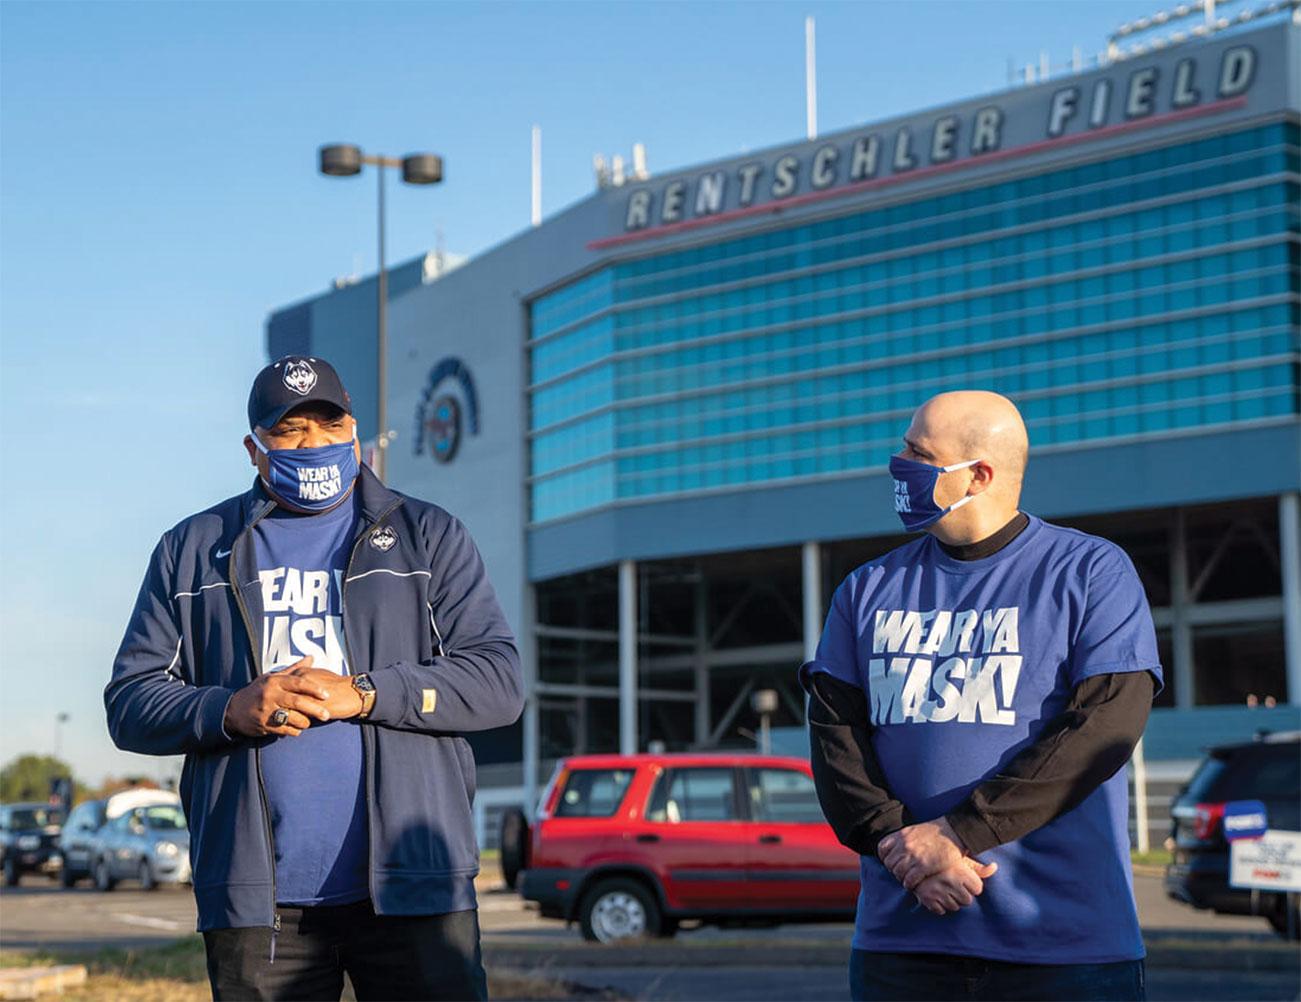 Chris Smith and Jason Jakubowski at Rentschler wearing Wear Ya Mask shirts and masks